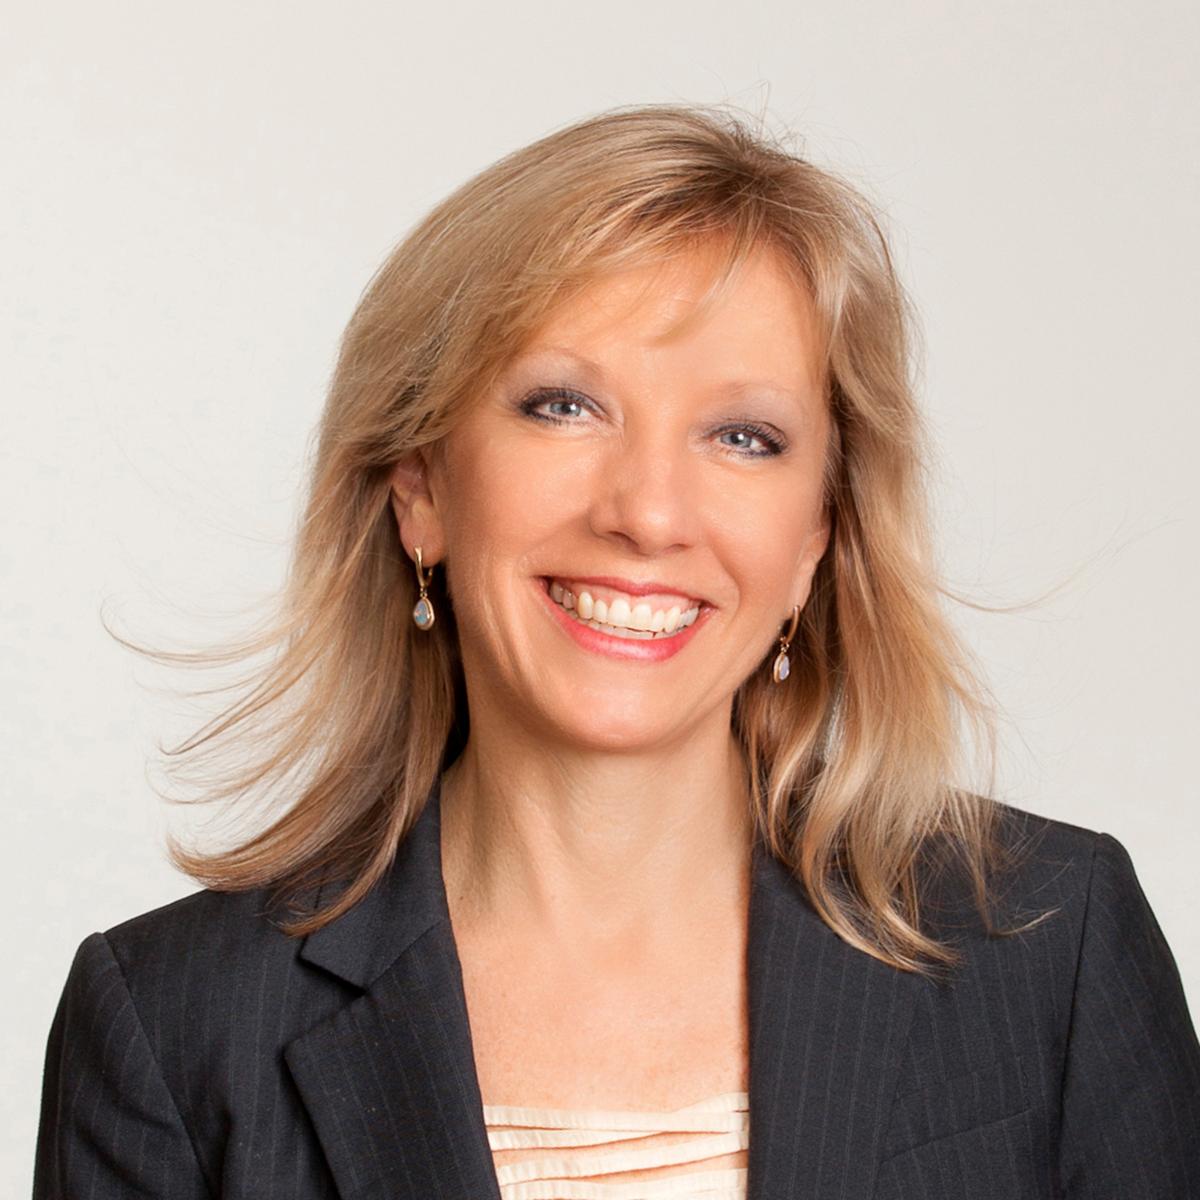 Speaker Susan Thomson